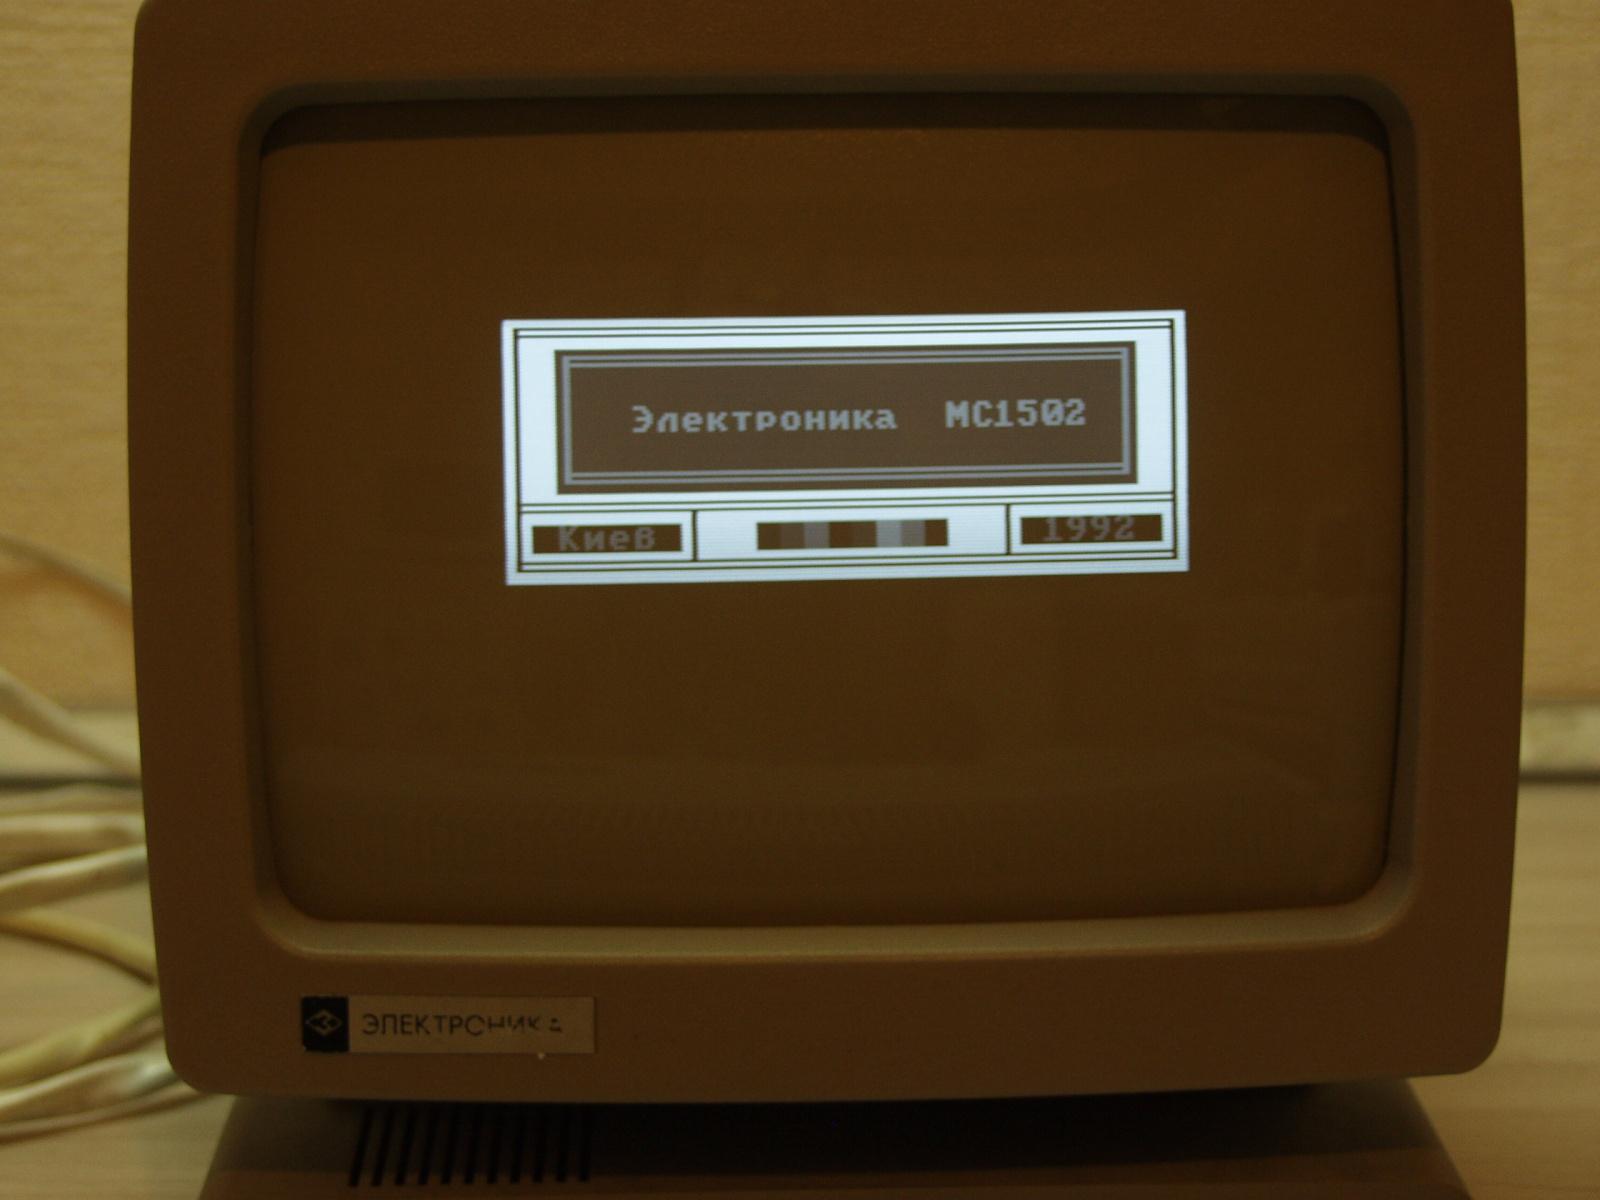 Советская IBM-PC Электроника МС-1502 - 15